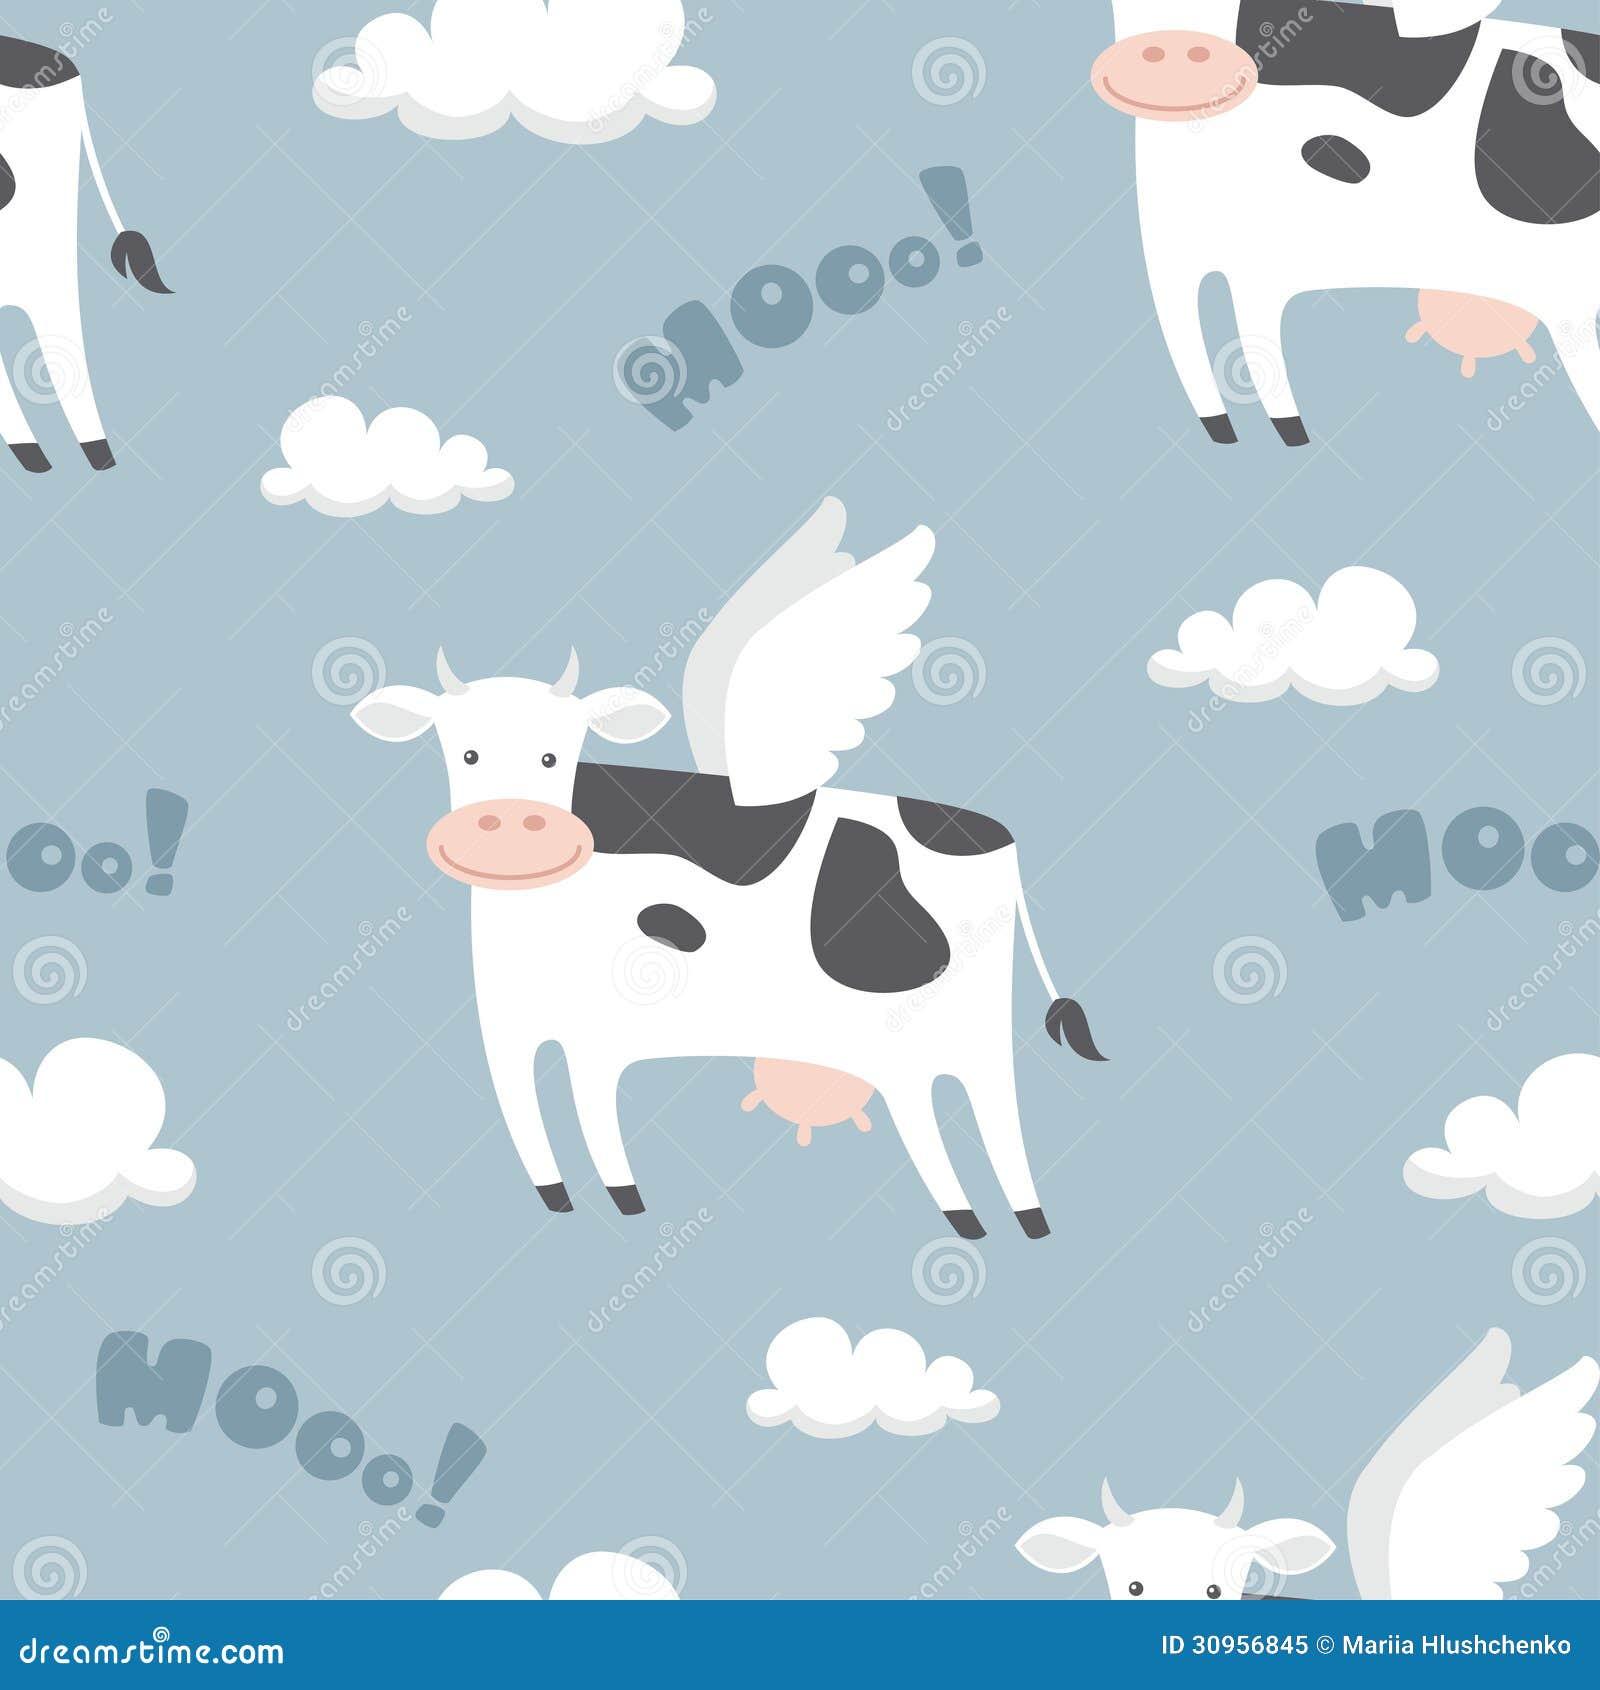 Flying Cows Stock Vector Illustration Of Illustration 30956845